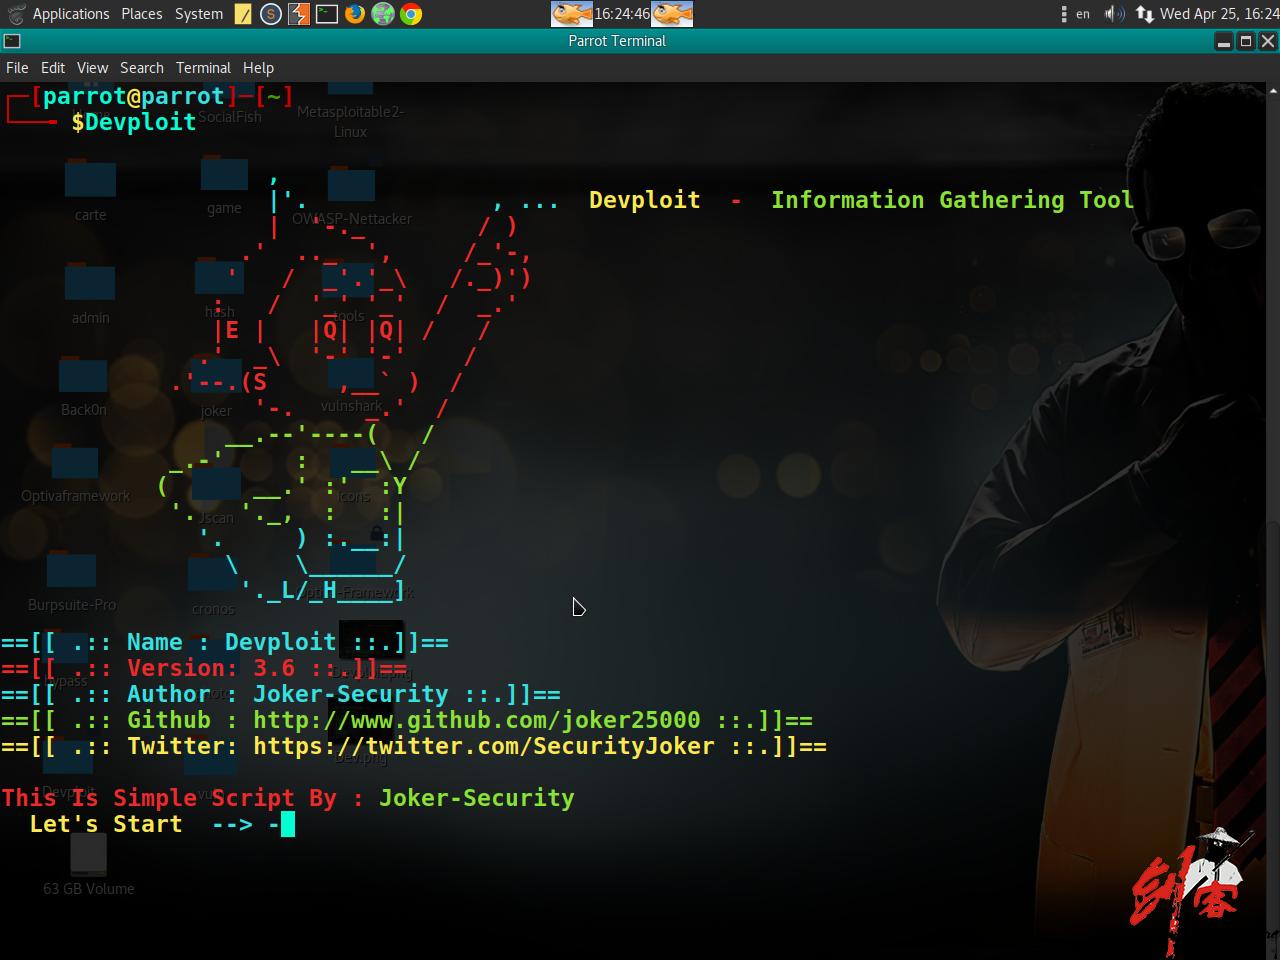 Devploit v3.6 - 信息收集工具